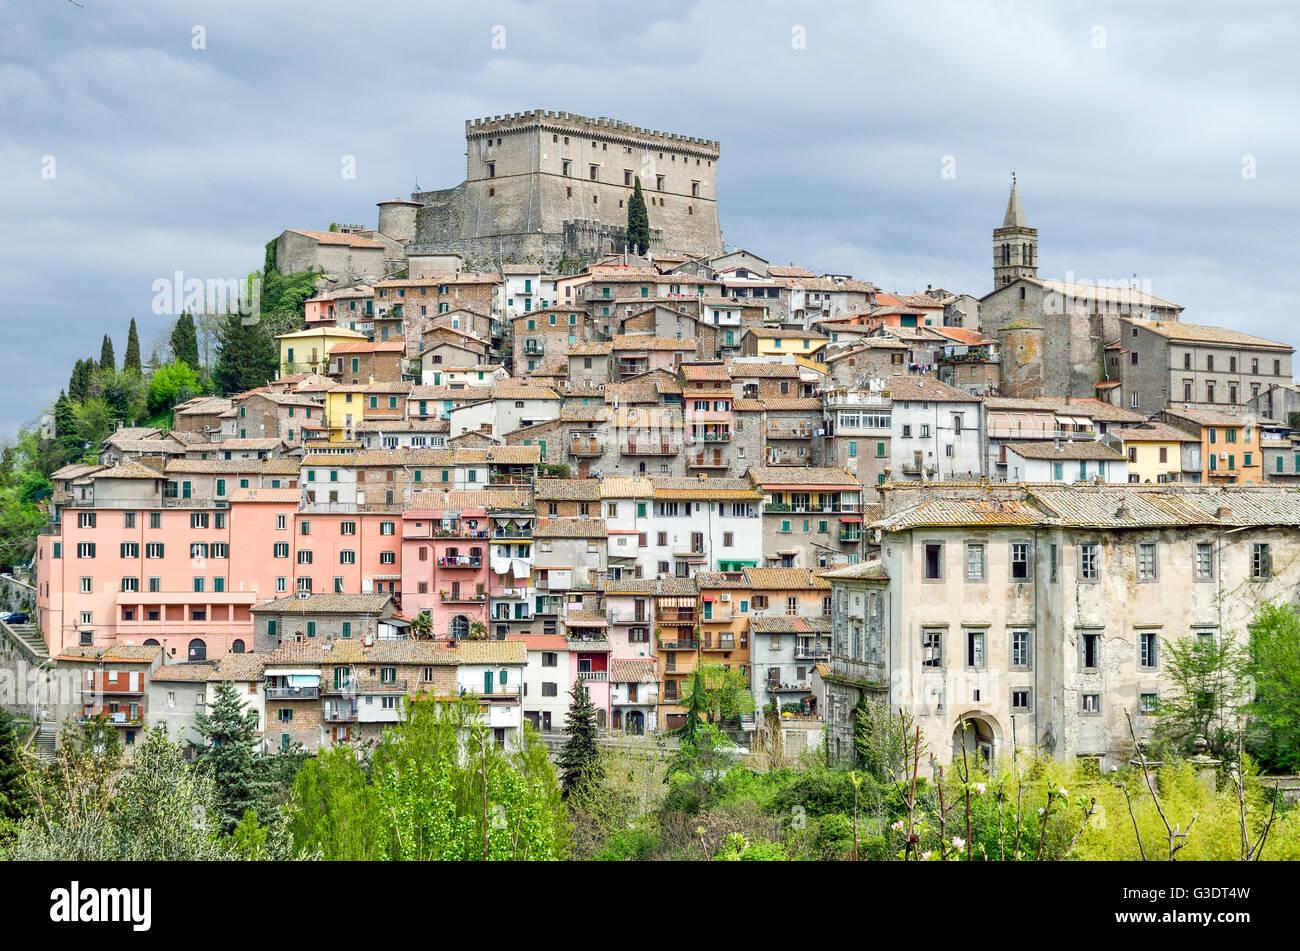 Viterbo - Soriano nel Cimino - Lazio - Italy travel - Stock Image